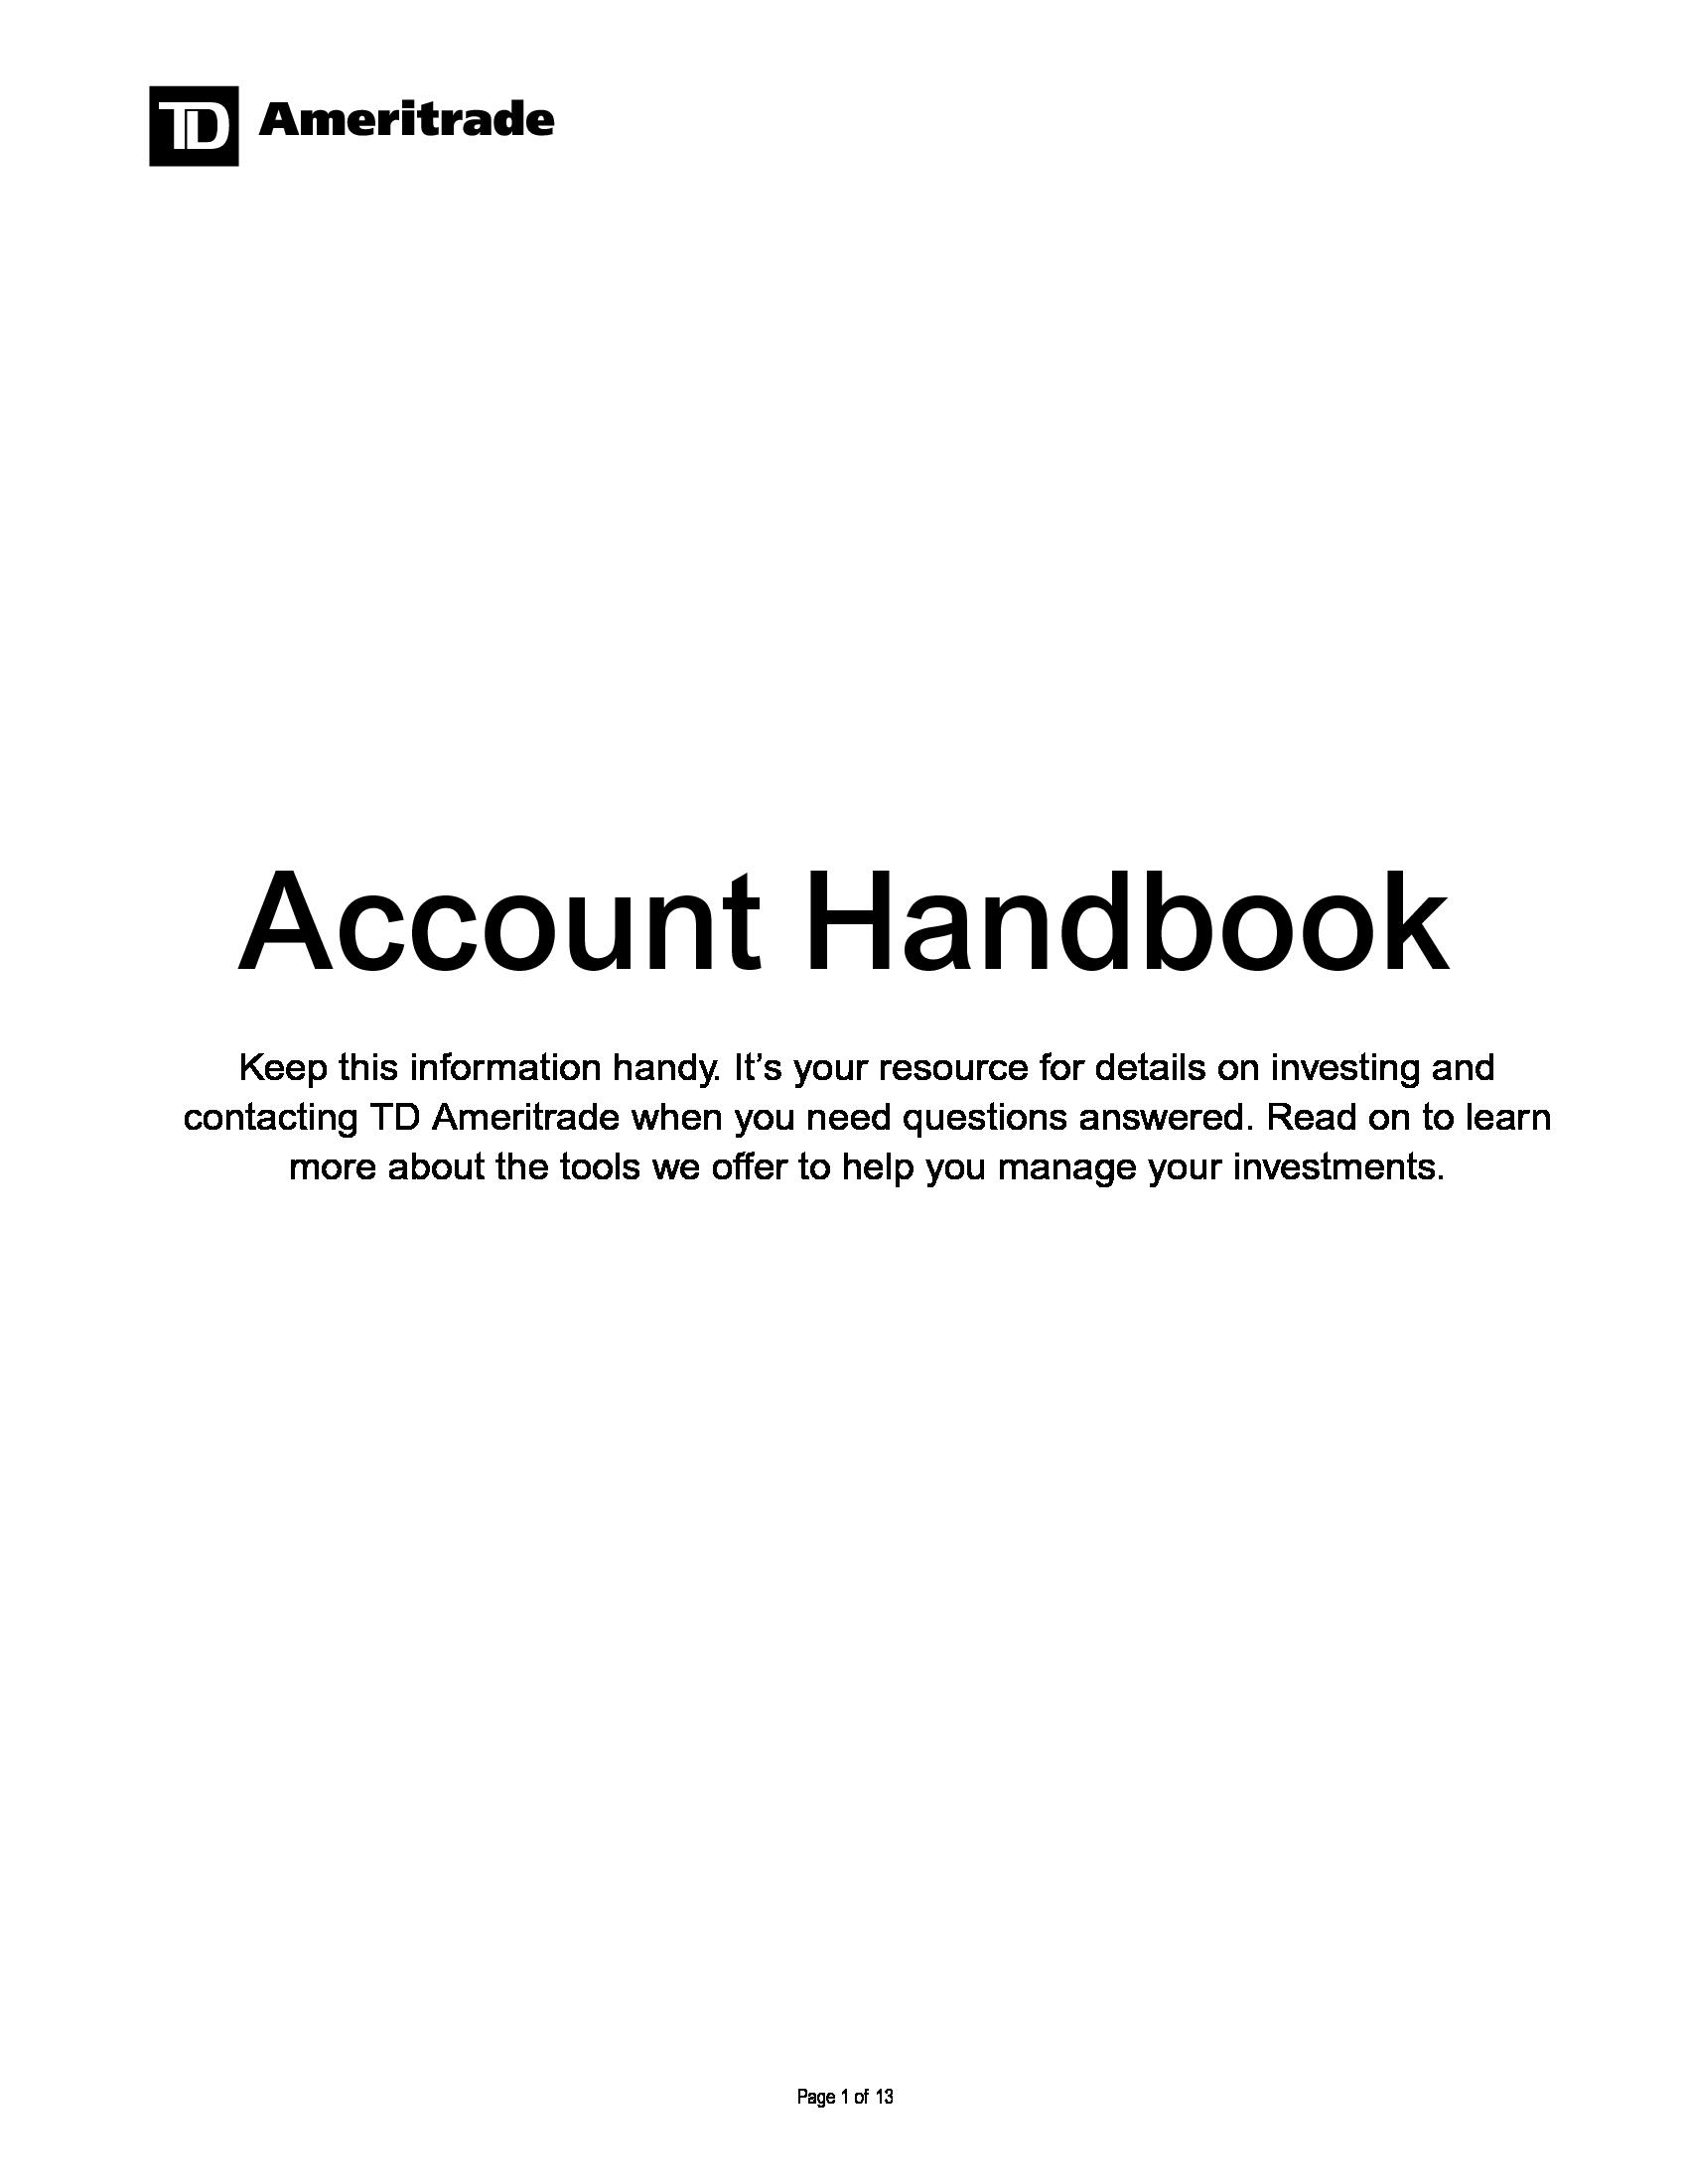 Advisorselect TD Ameritrade – Account Handbook